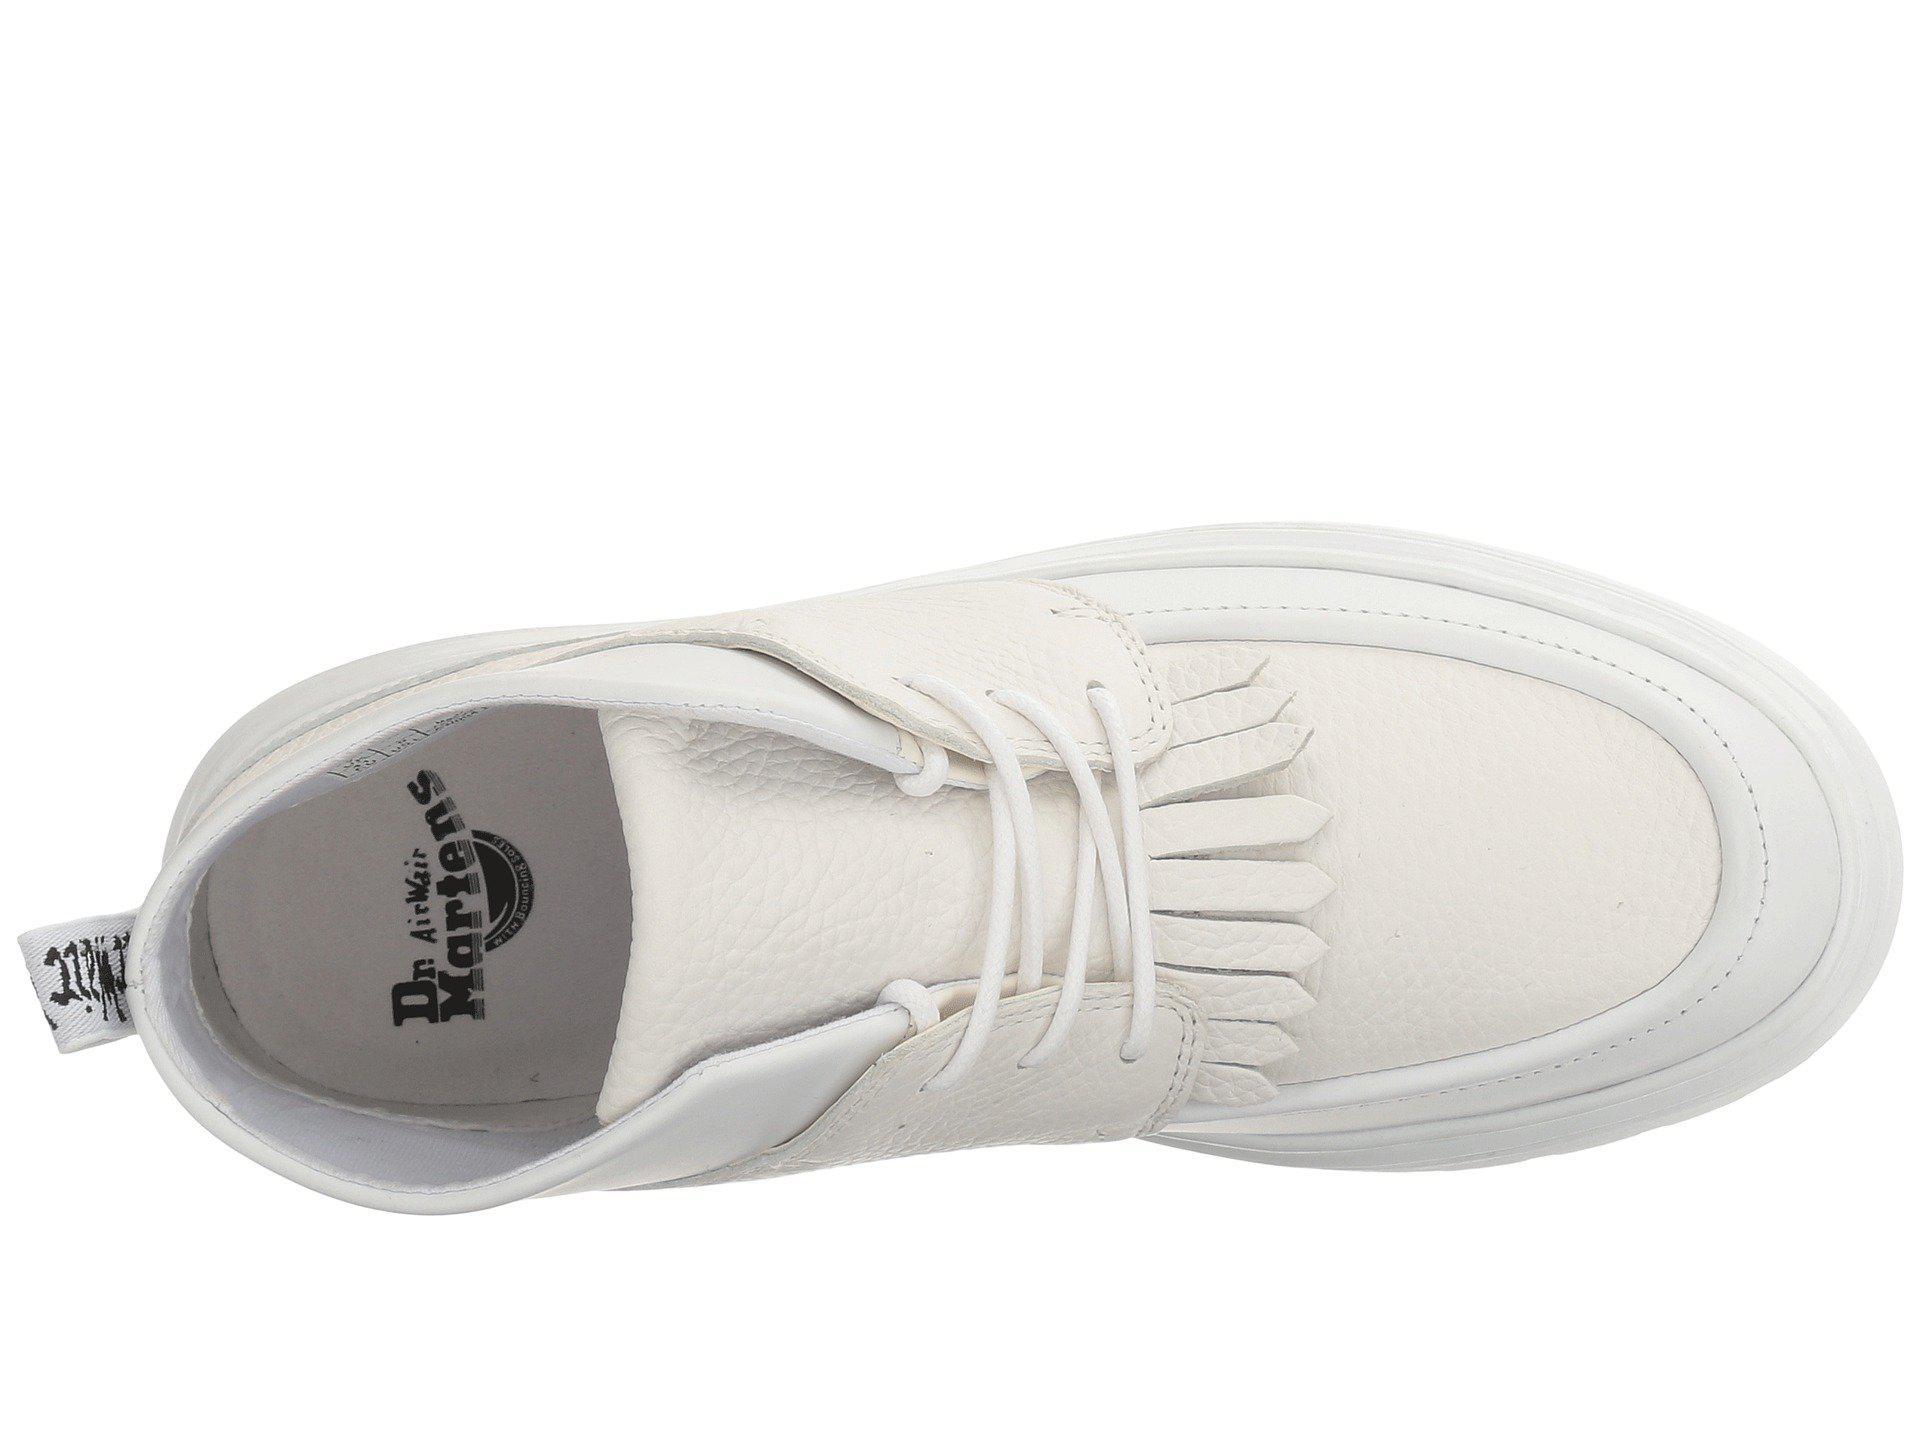 bester Preis großer Rabatt komplettes Angebot an Artikeln Jemima, Unisex Adults' Lace-up Shoes